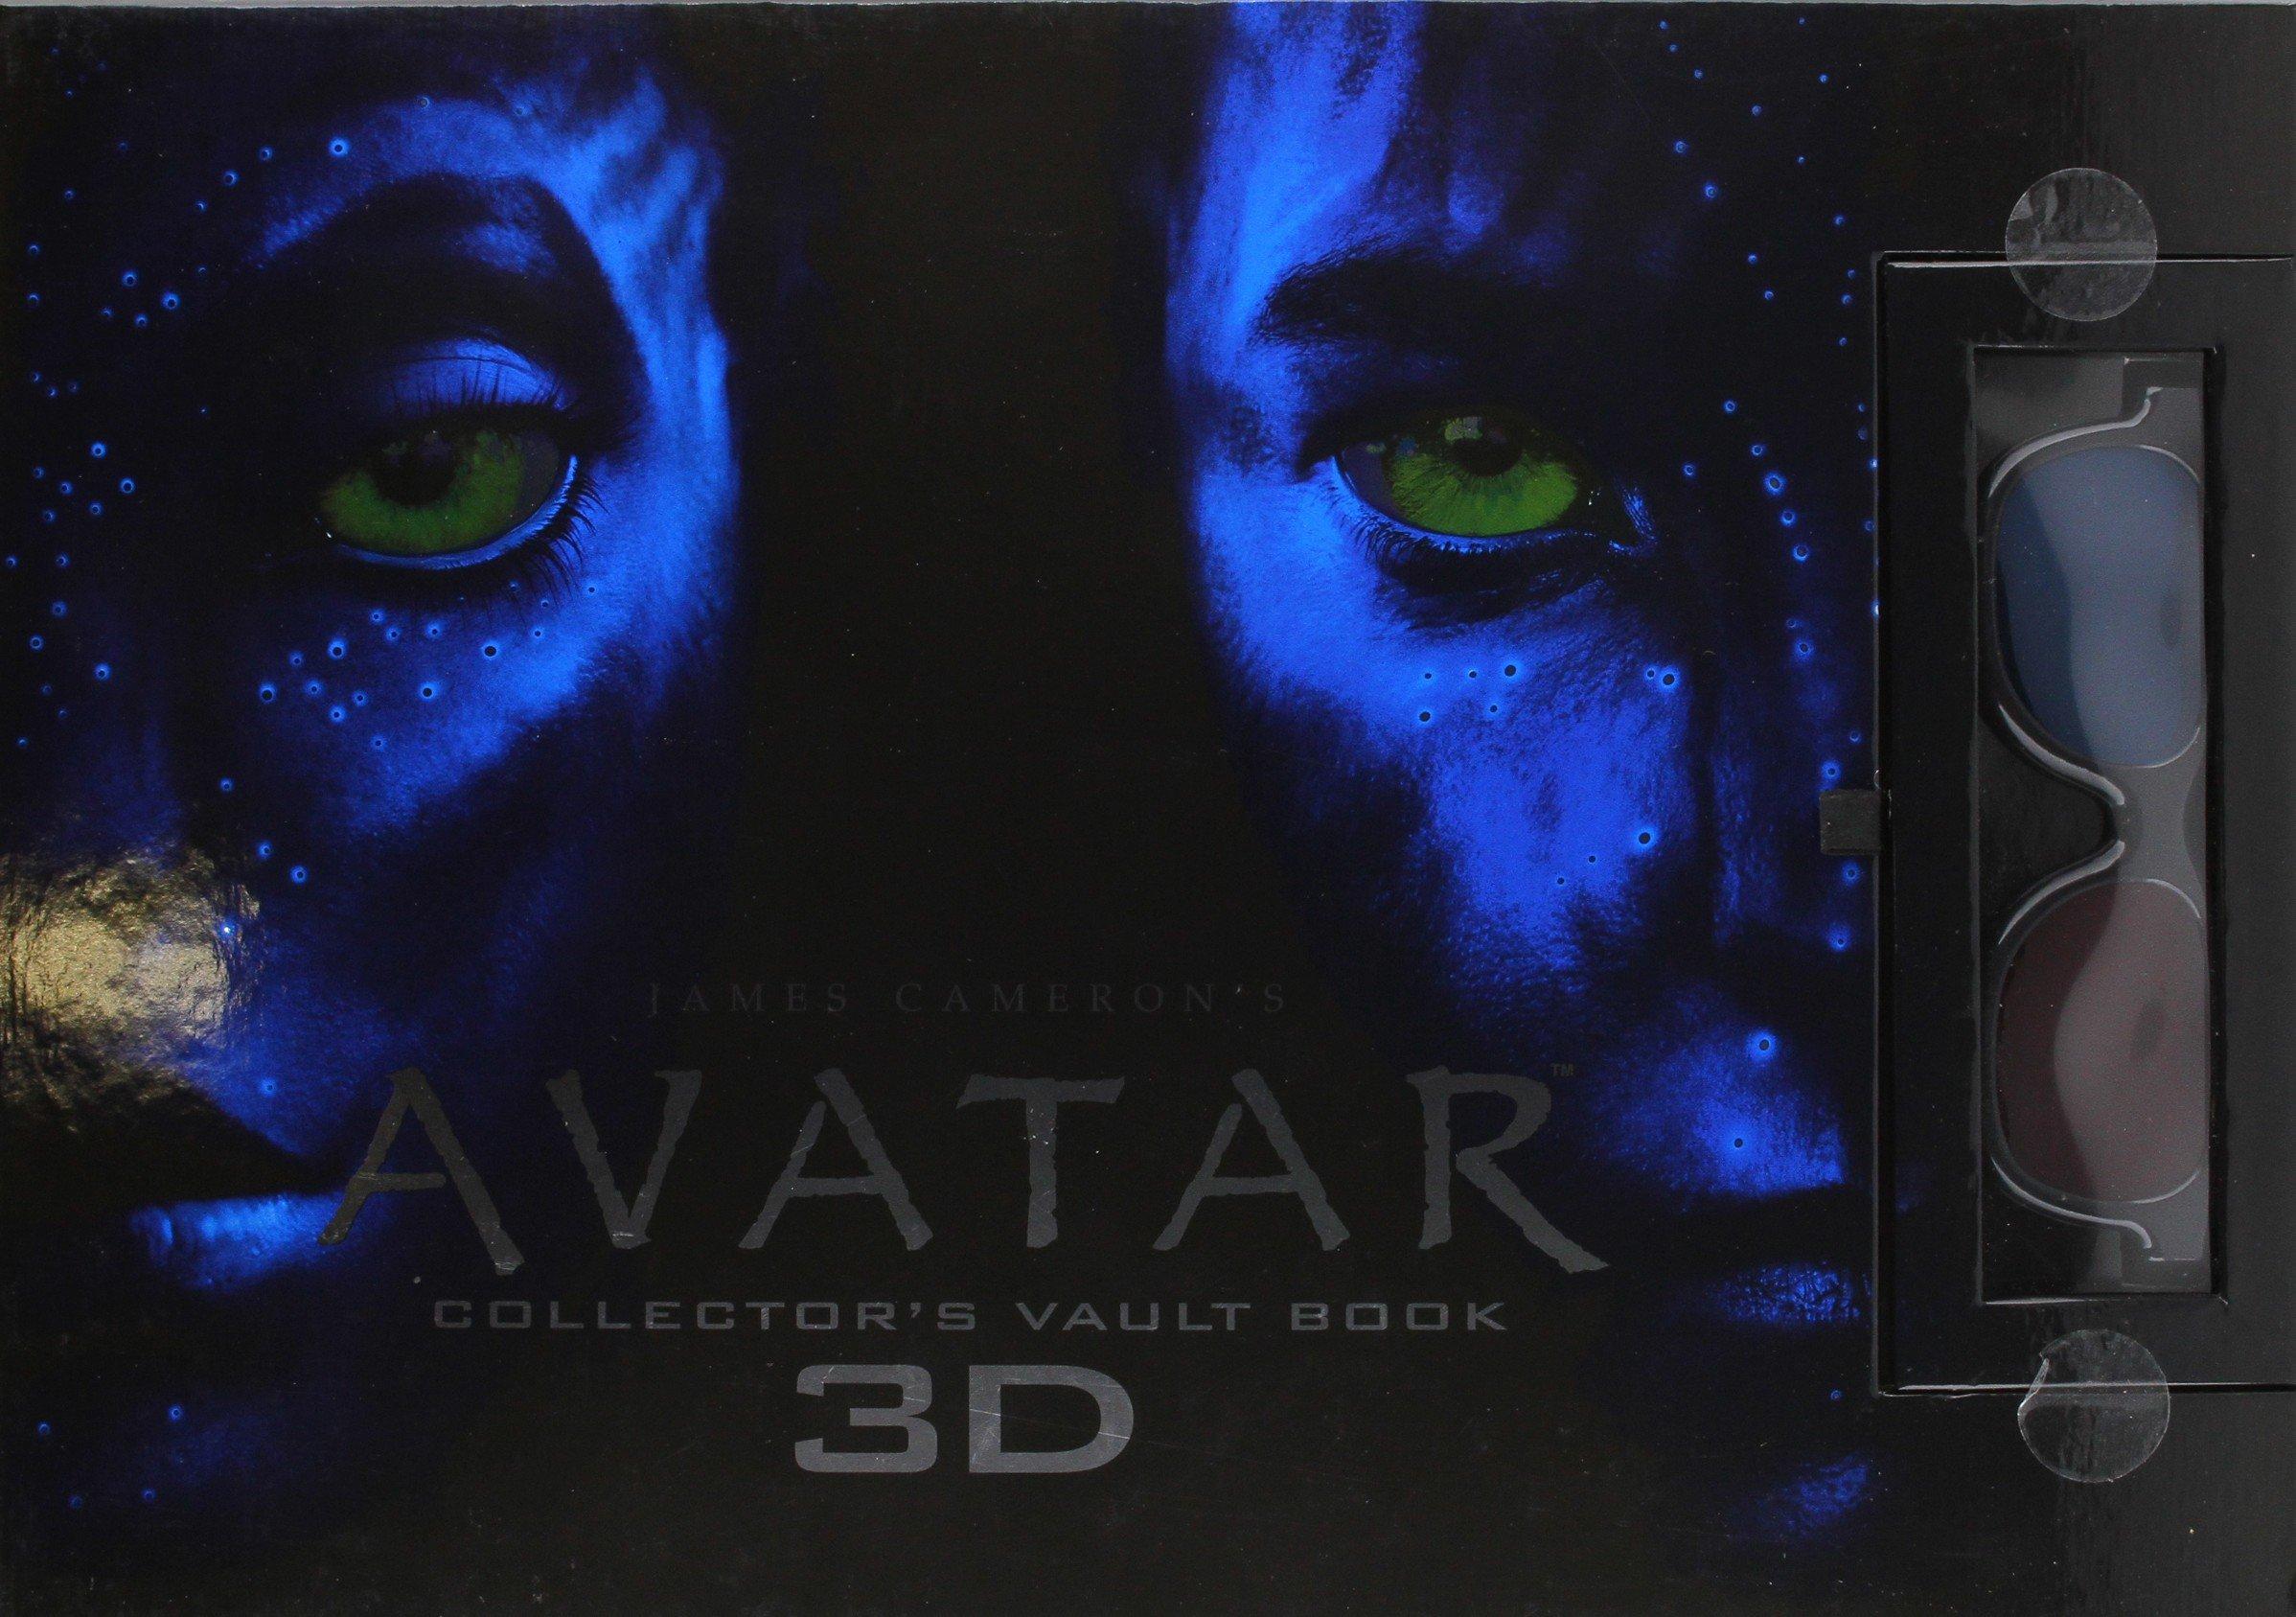 Avatar D Collectors Vault Whitman Publishing  Amazon Com Books